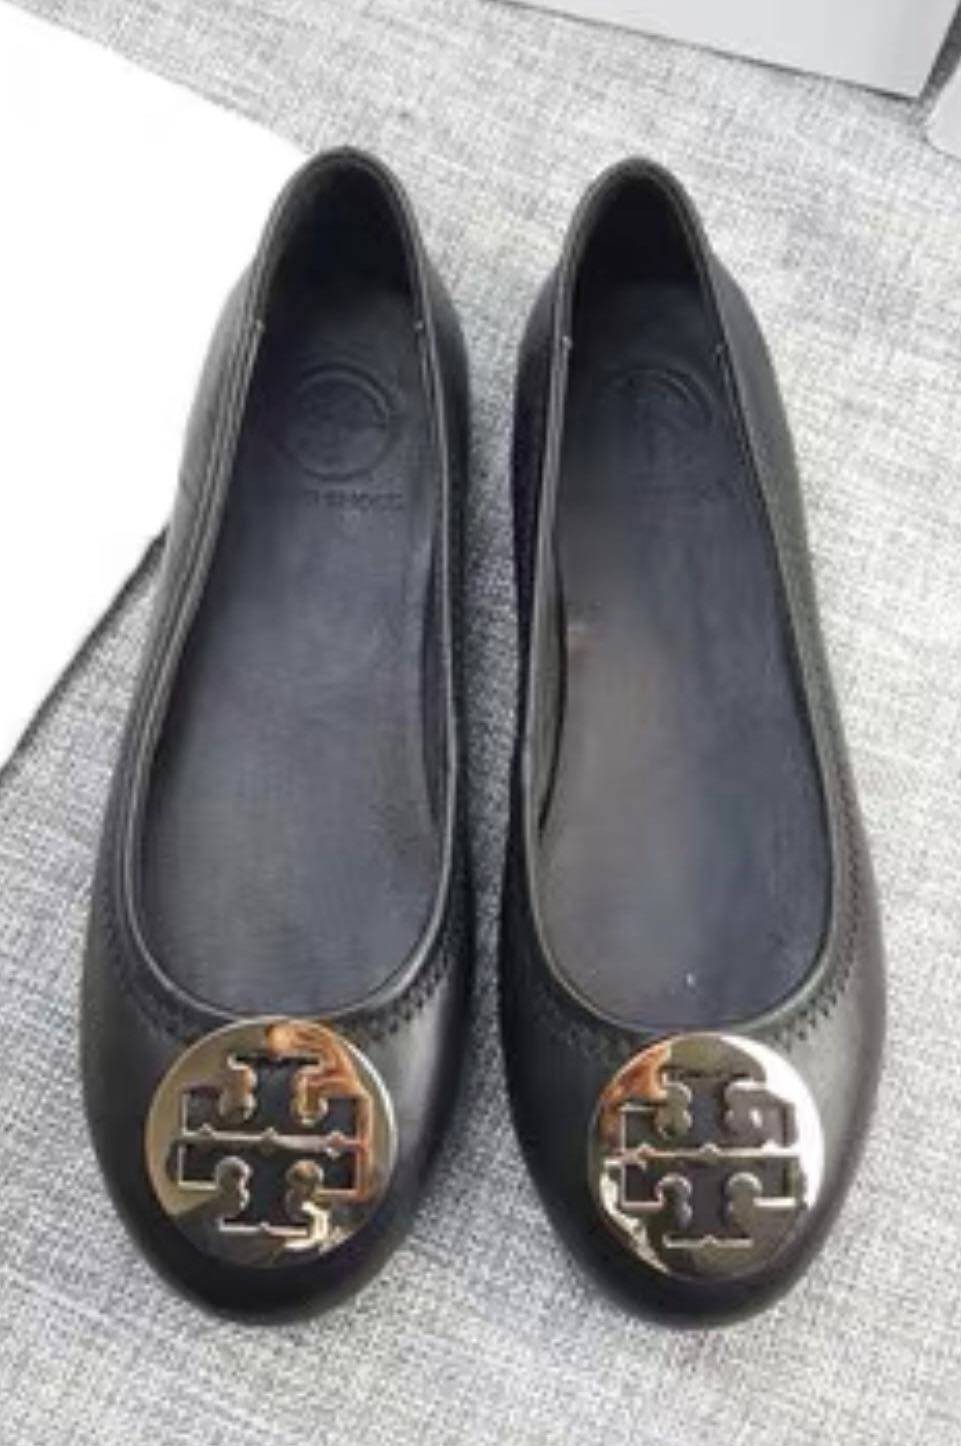 7f7a86810 Tory Burch ballet flat shoes